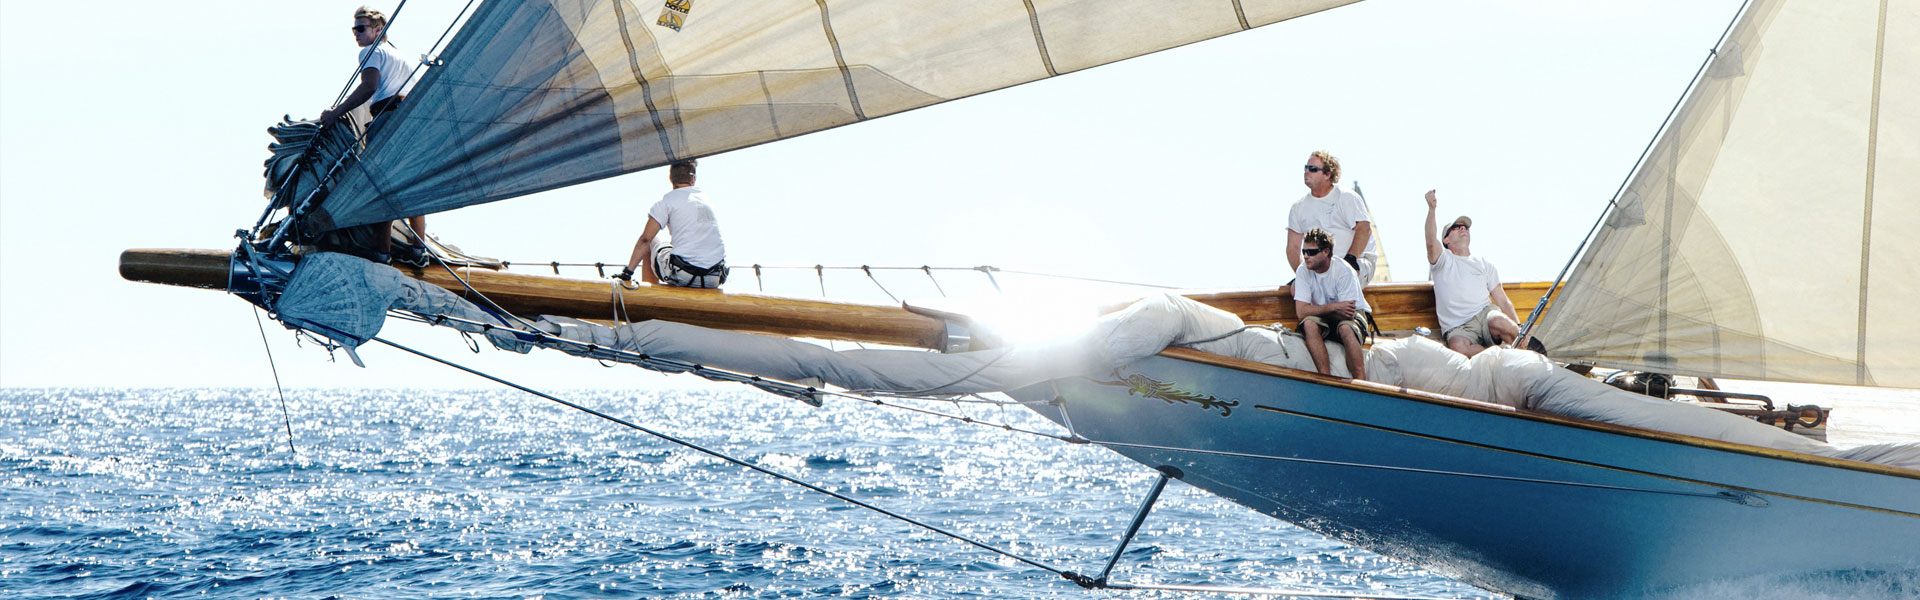 Elite-Yachting-Slide-1